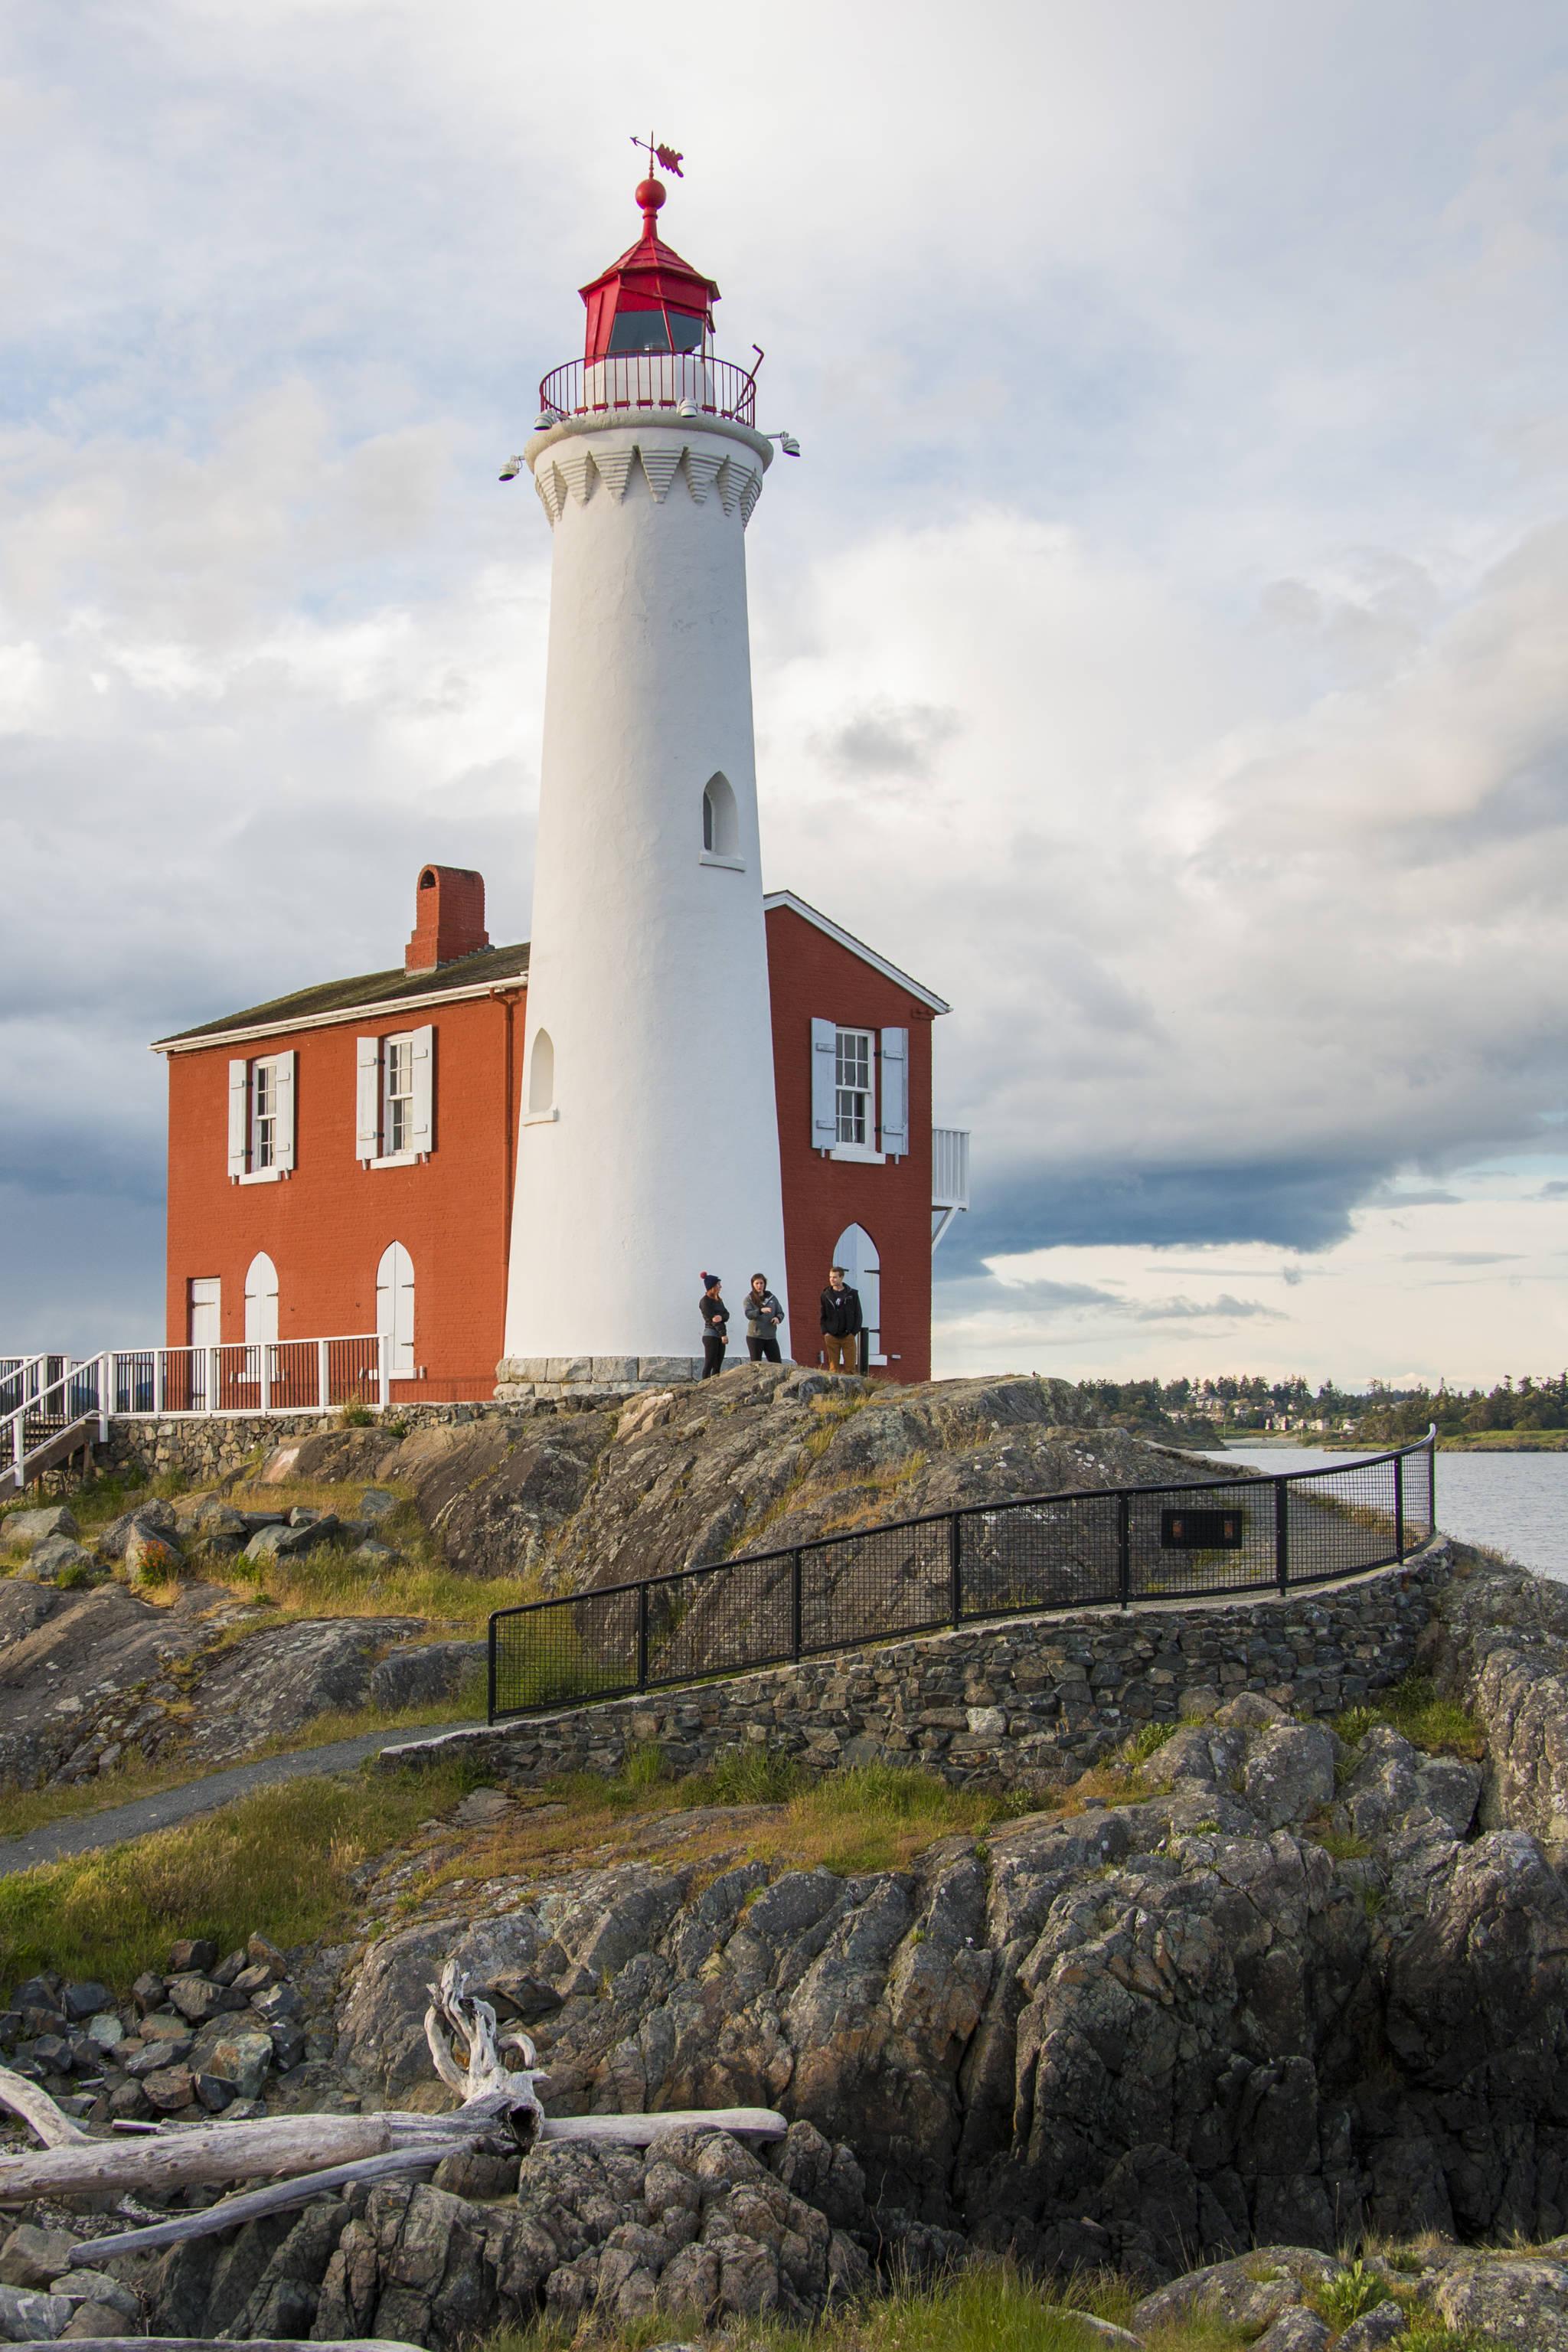 Fisgard Lighthouse celebrates its 160th birthday on Nov. 16. (Photo courtesy of Parks Canada)